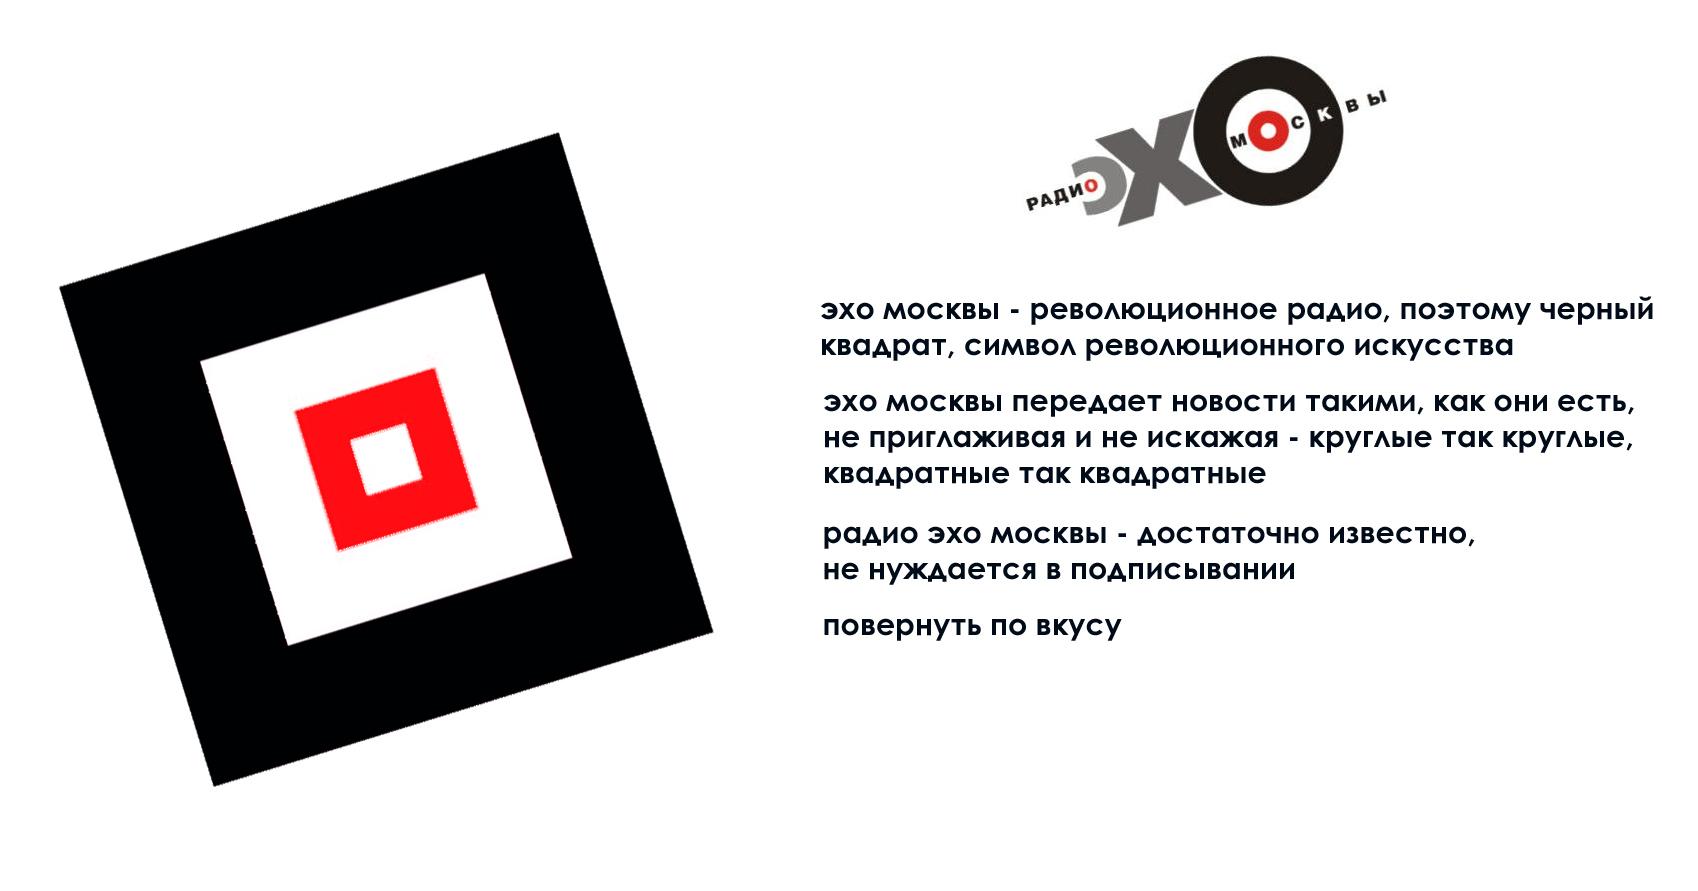 Дизайн логотипа р/с Эхо Москвы. фото f_208562666924791a.jpg